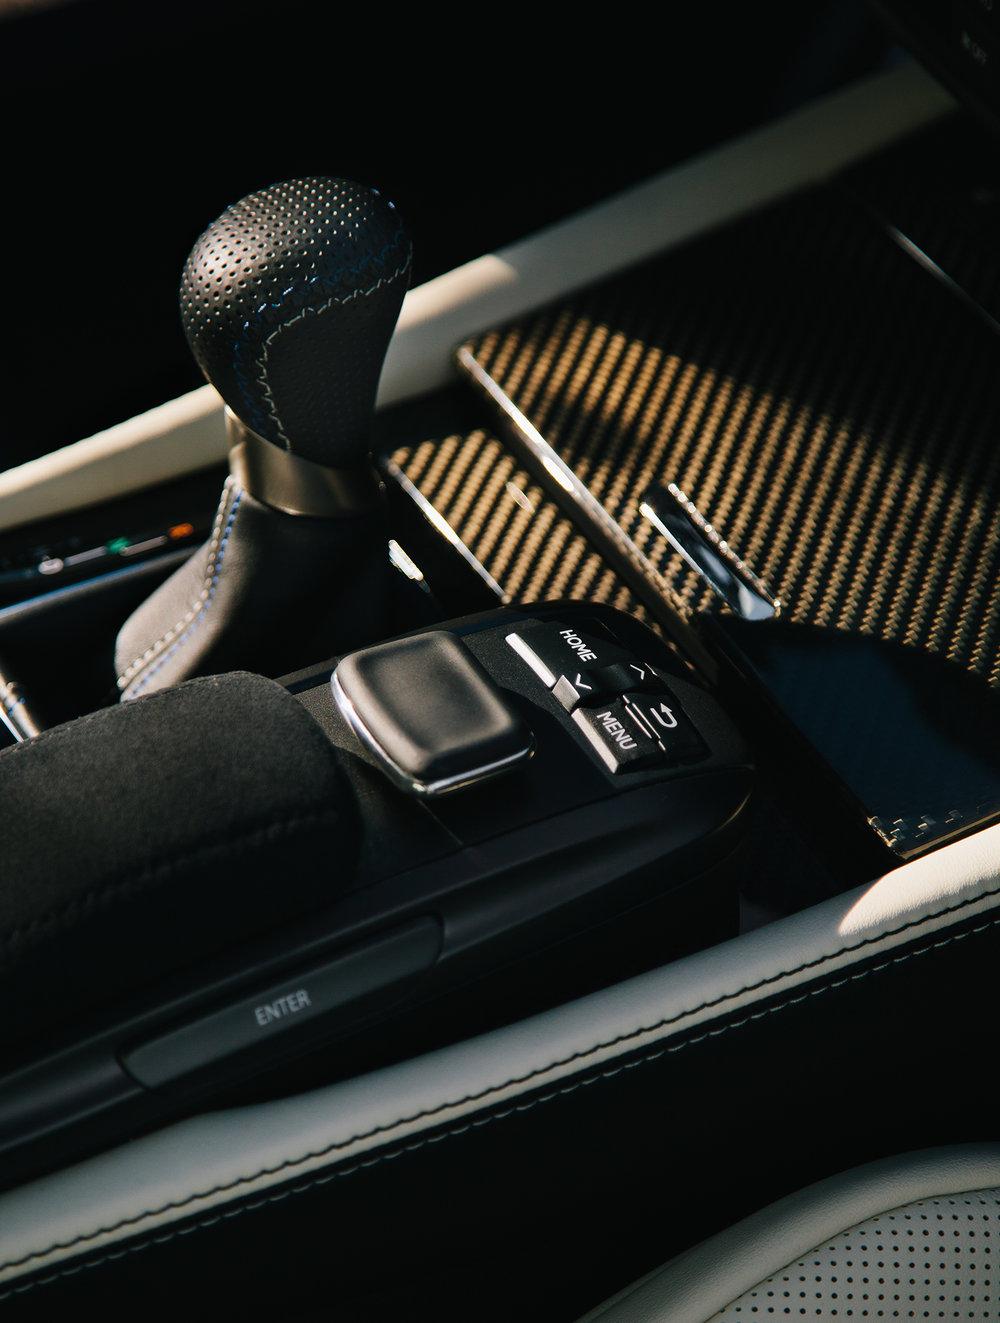 Lexus_Reveal_Details_Navigator_044.jpg